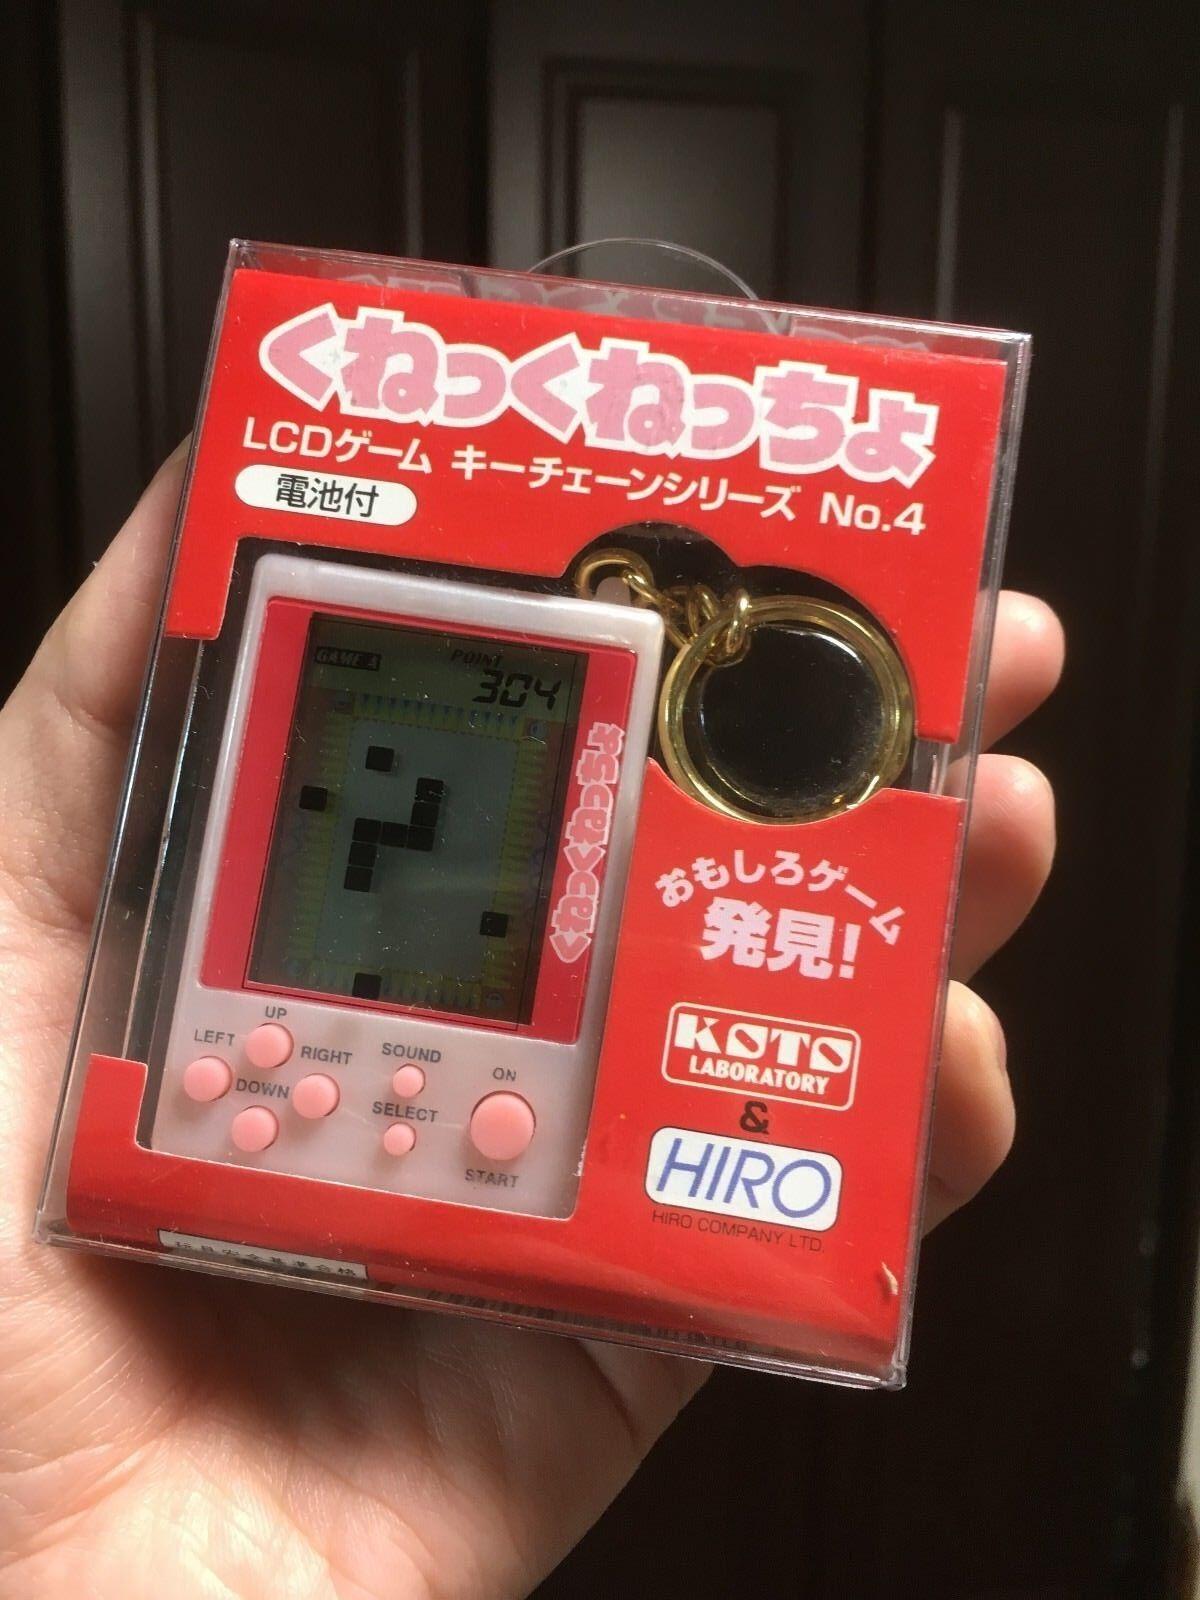 NEW NEW NEW RARE HIRO LCD GAME KUNEKUNECCHO Kune Kunet-chyo JAPAN KOTO GUMPEY 09b0af